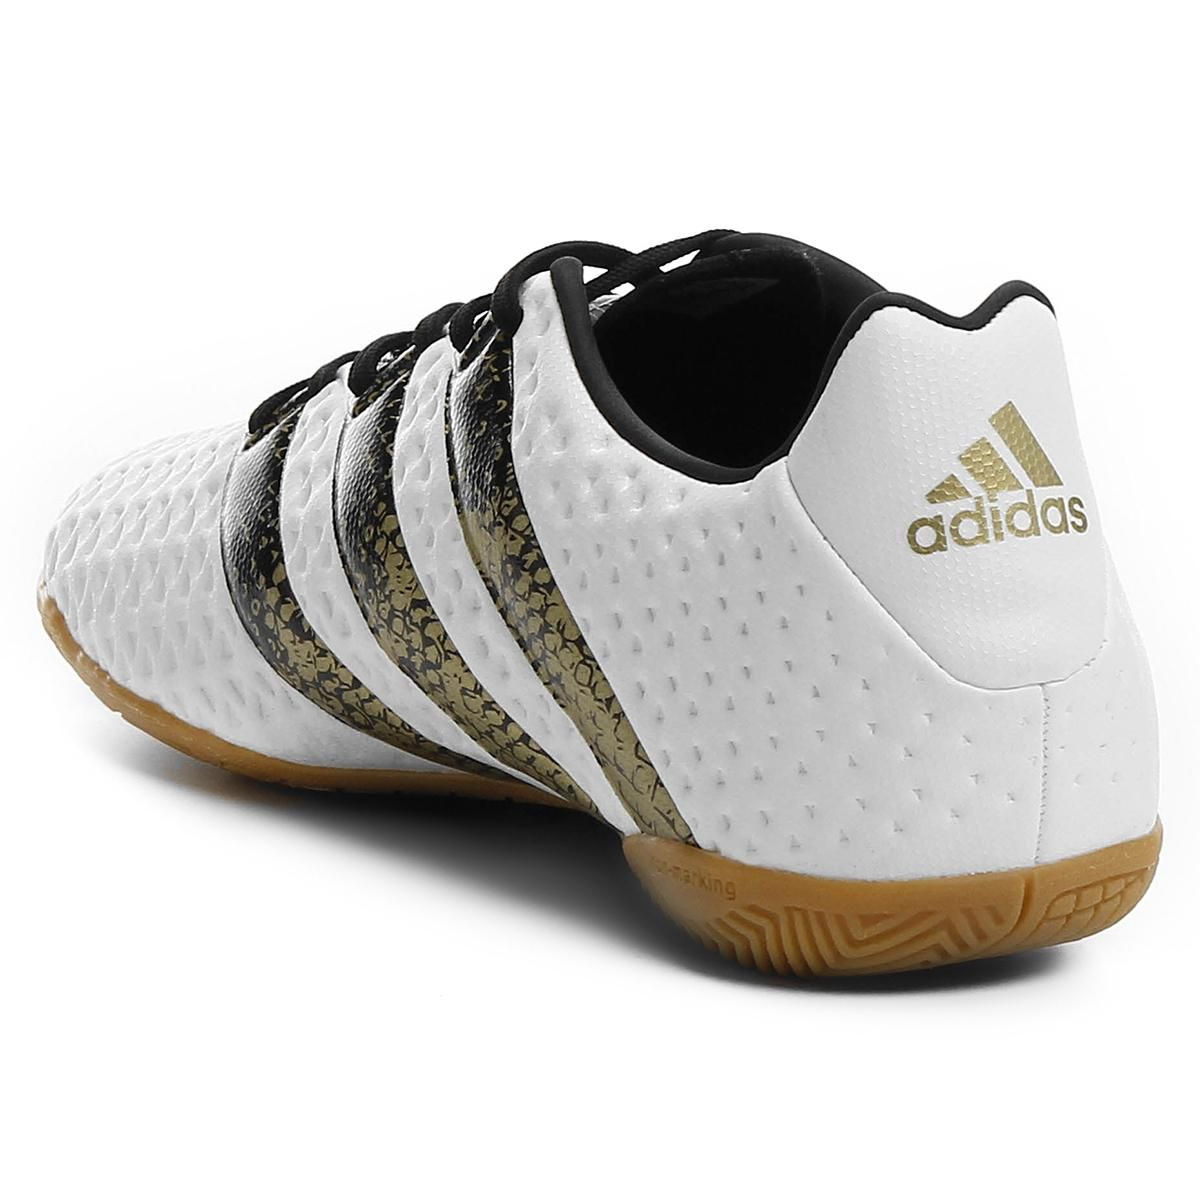 b47483e812 Chuteira Futsal Adidas Ace 16.4 In Listas - BRACIA SHOP  Loja de ...